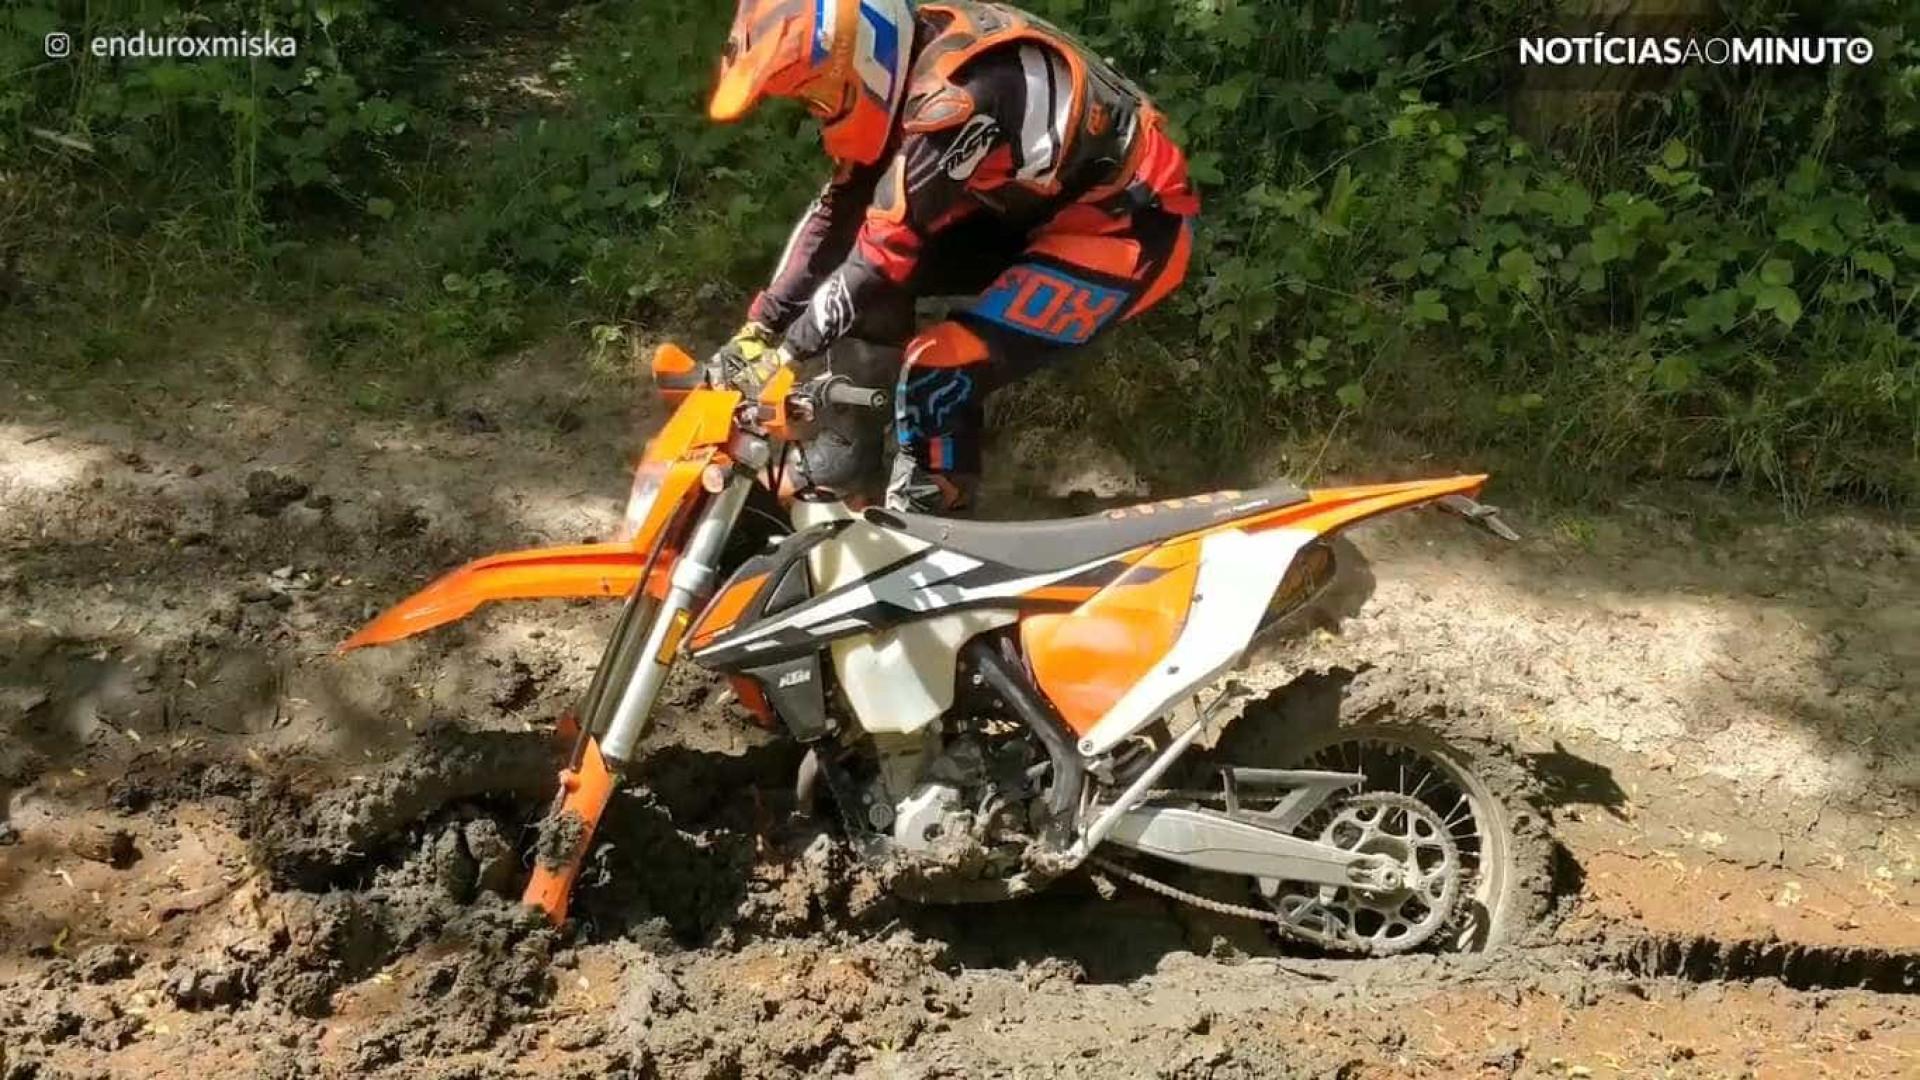 Jovem tenta retirar moto atolada na lama; vídeo